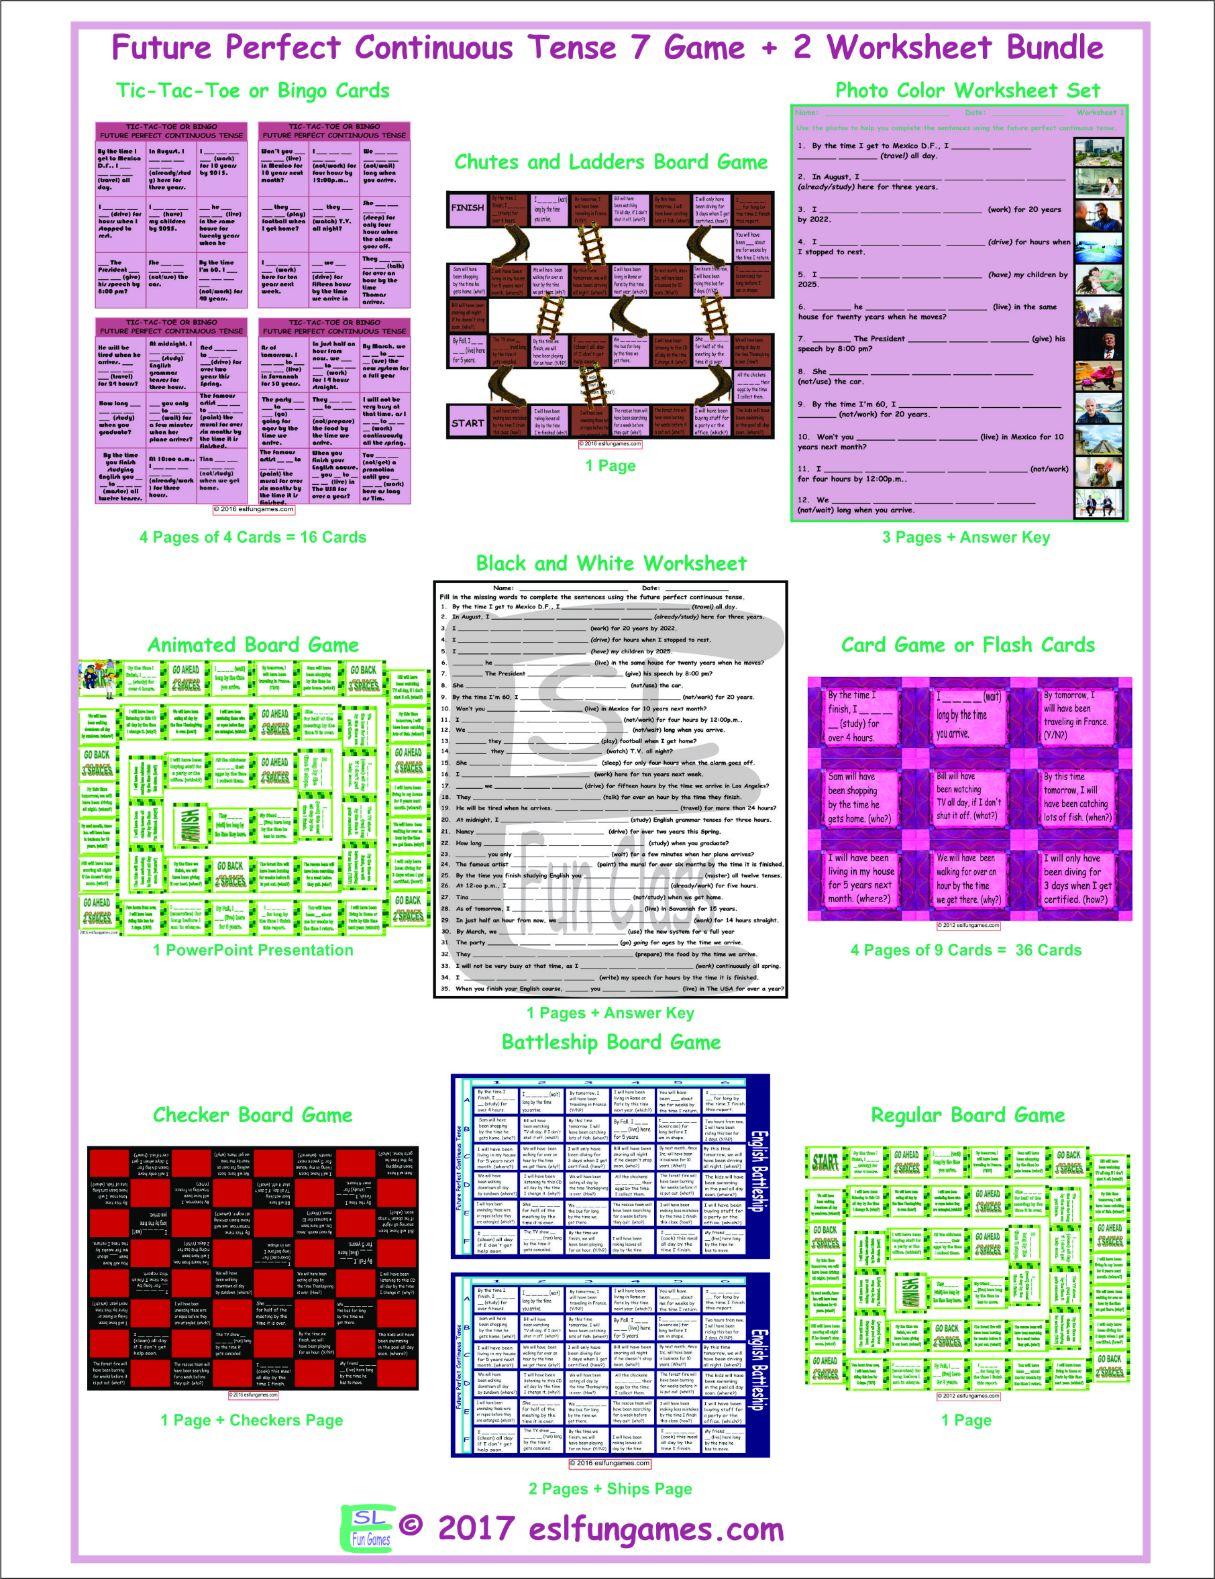 Future Perfect Continuous Tense 7 Game Plus 2 Worksheet